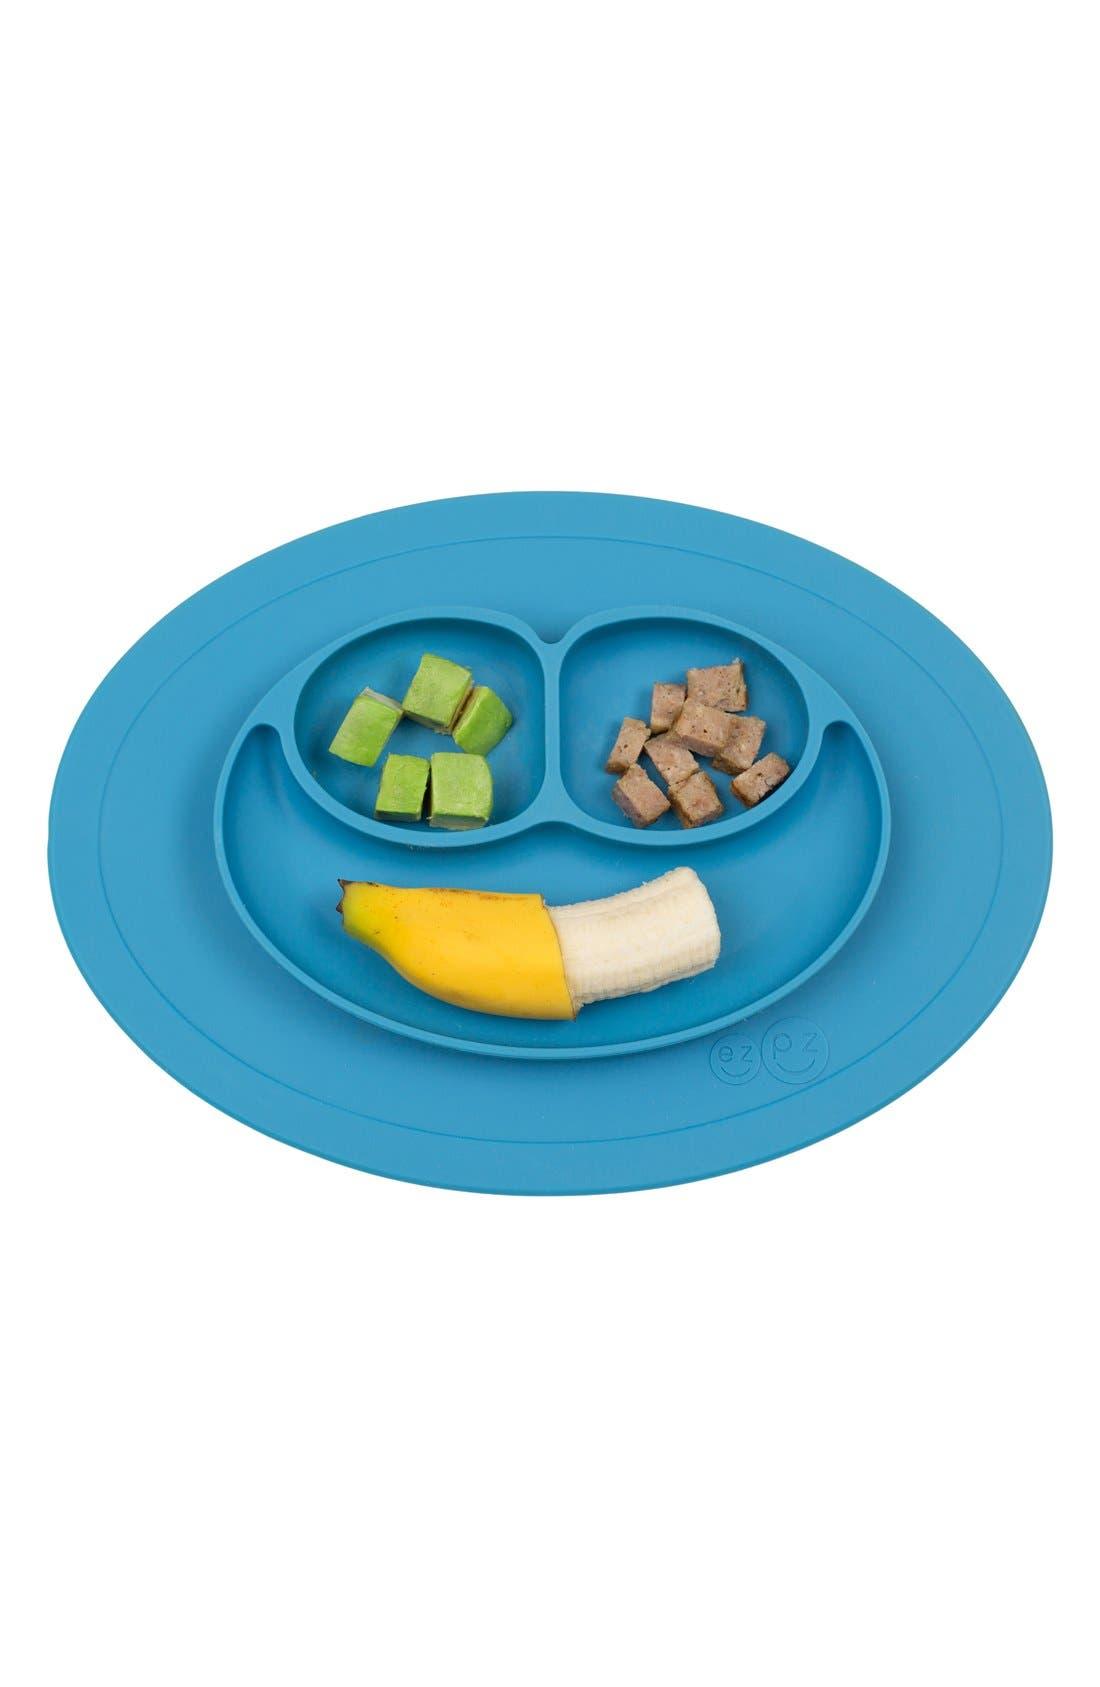 Alternate Image 3  - ezpz 'Mini Mat' Silicone Feeding Mat